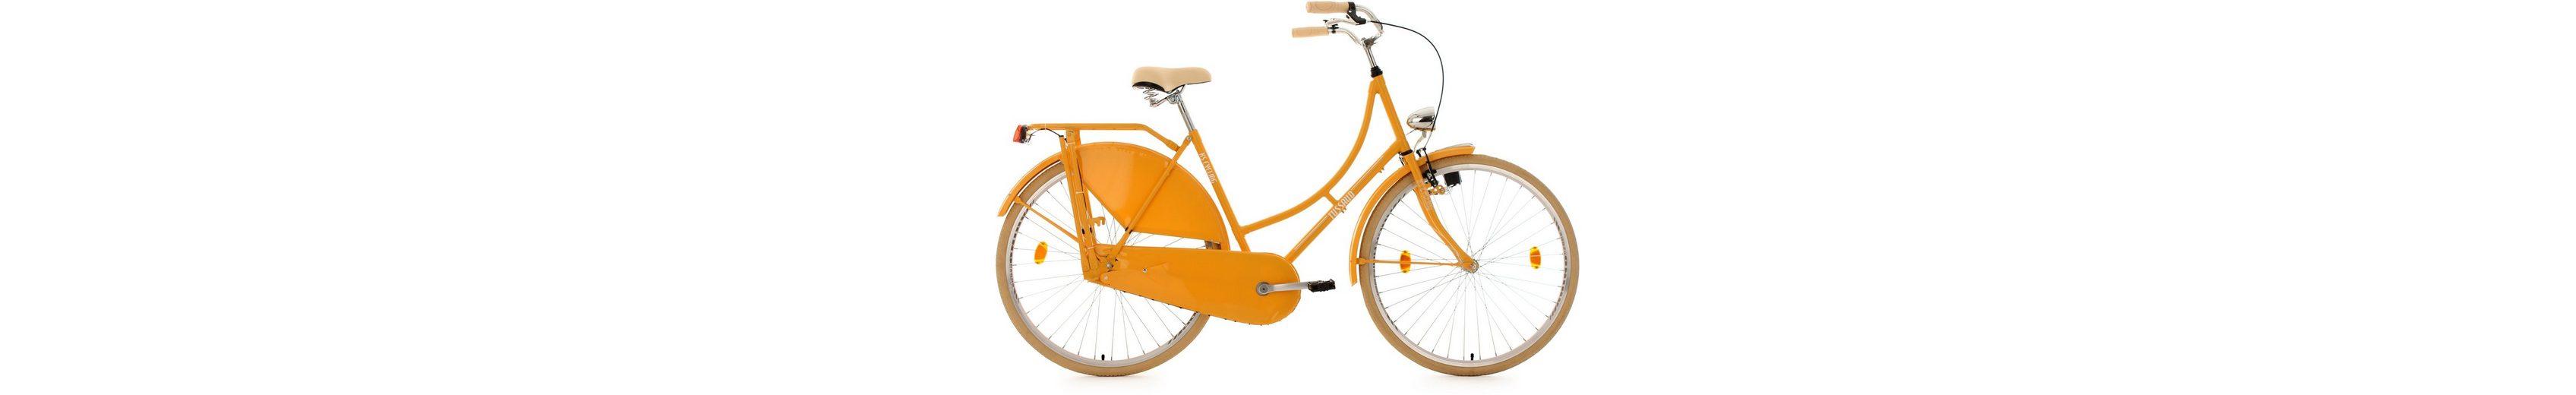 KS Cycling Hollandrad, 28 Zoll, gelb, »Tussaud«